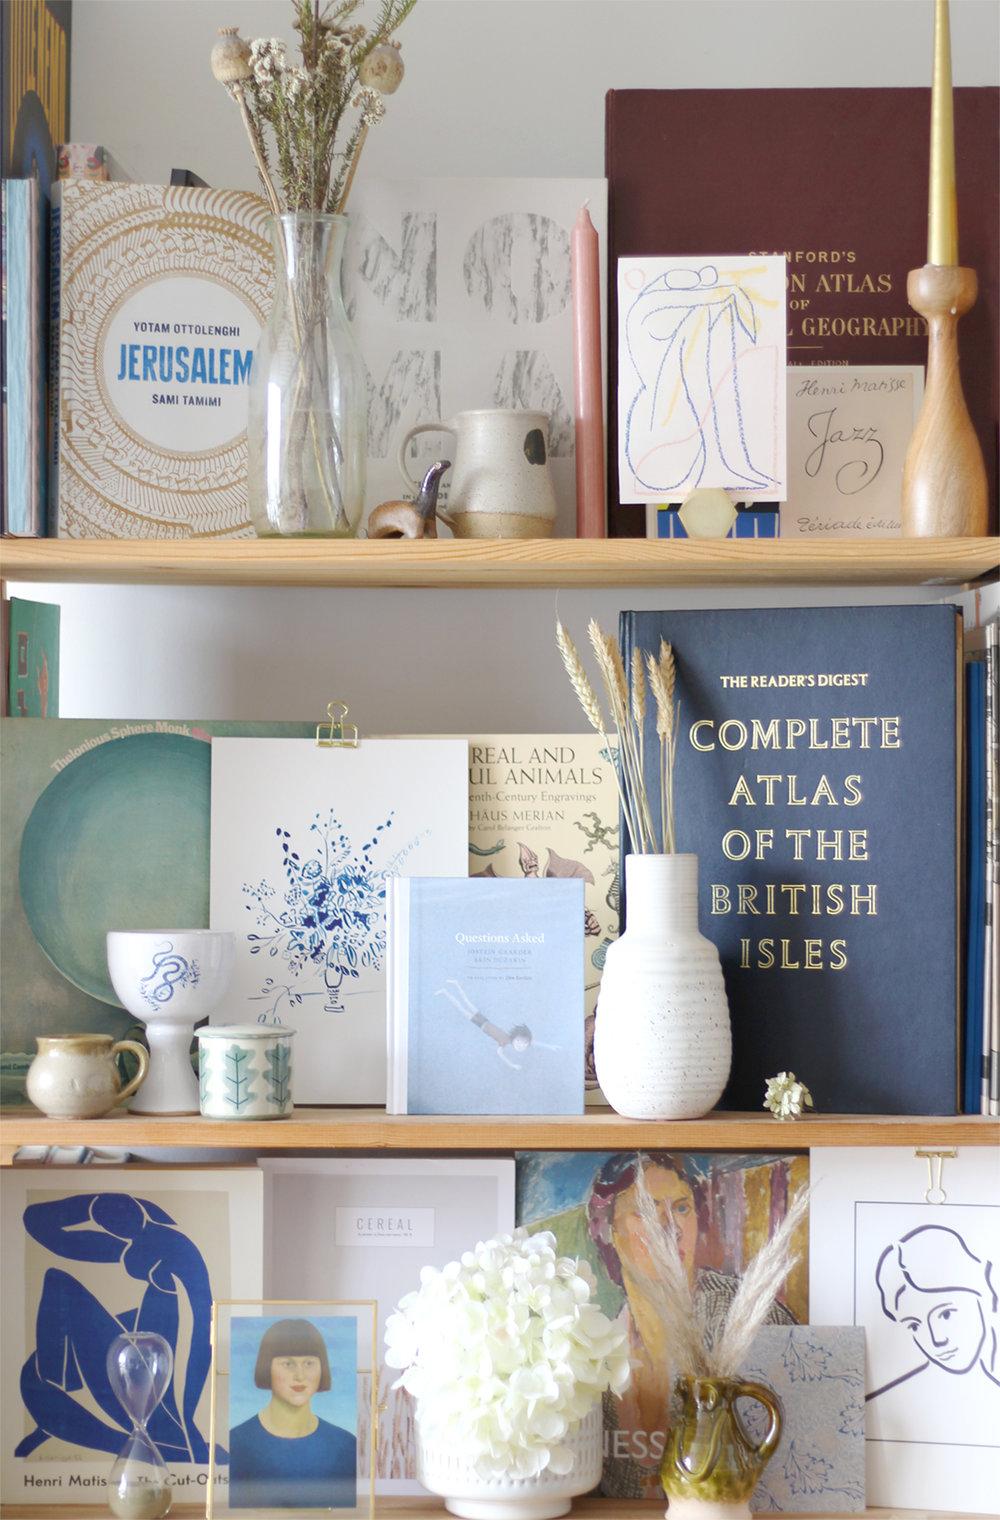 nancy-straughan-interior-stylist-bookshelf-styling.jpg